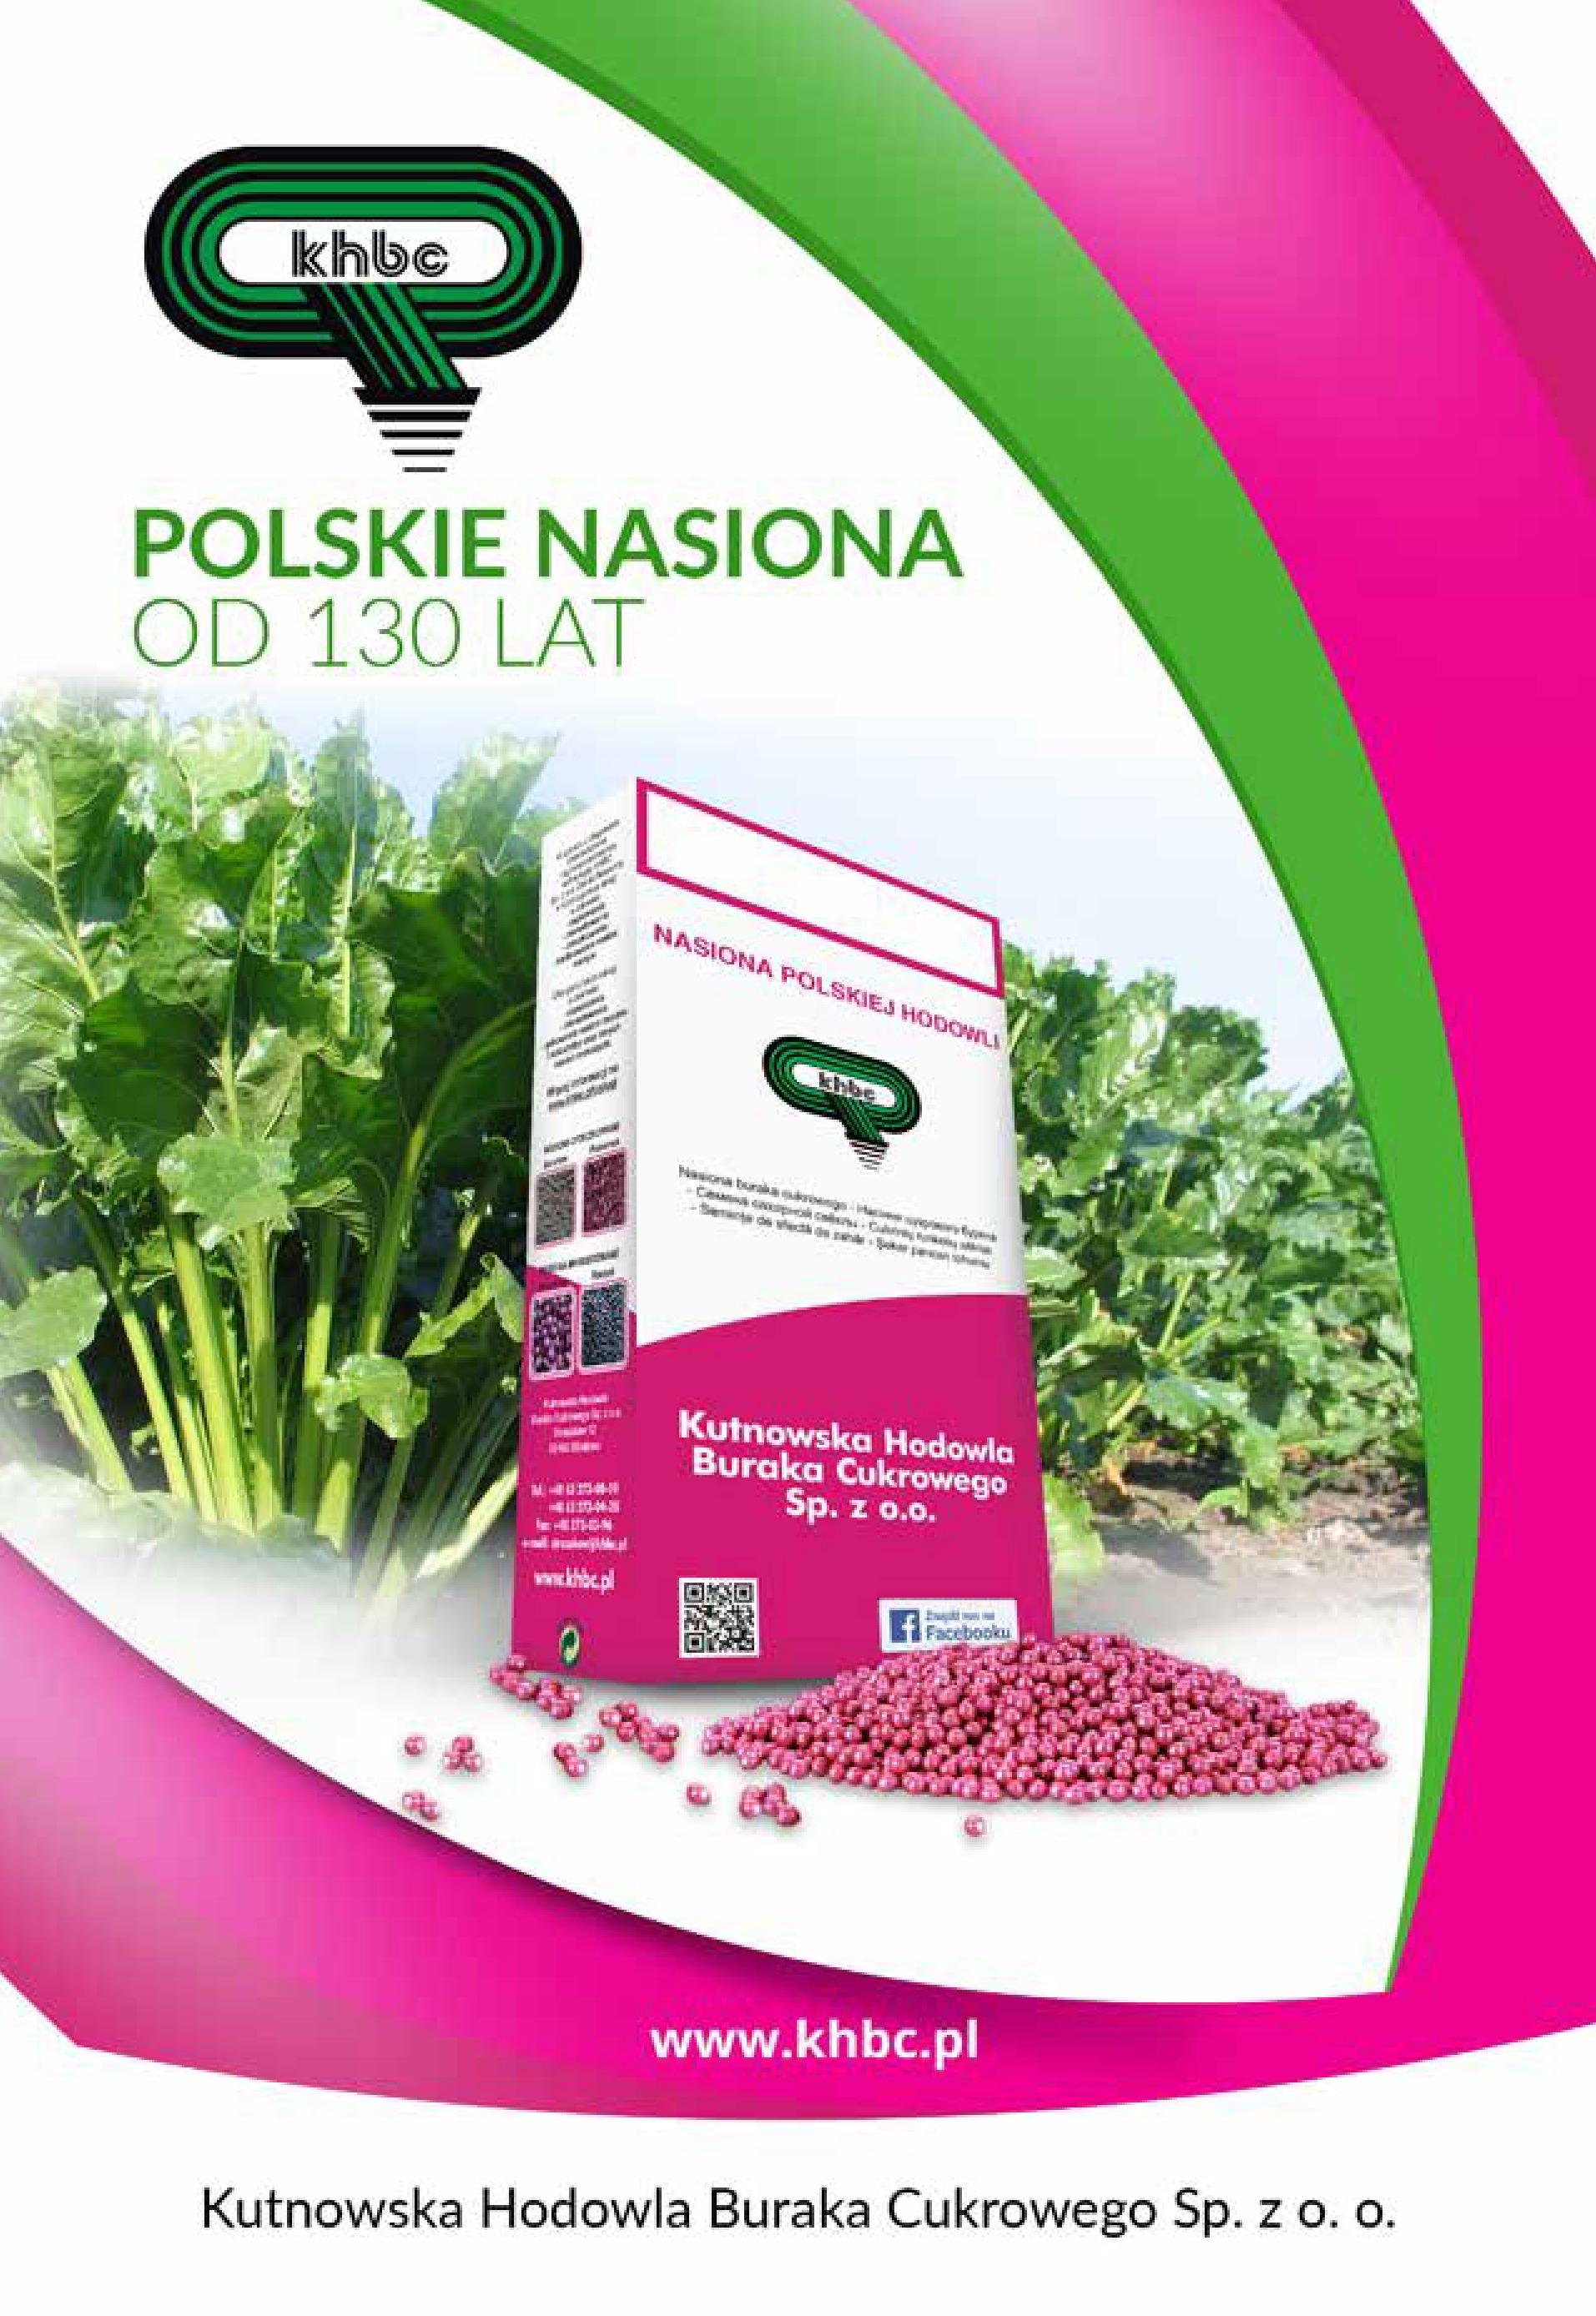 Polskie nasiona od130 lat